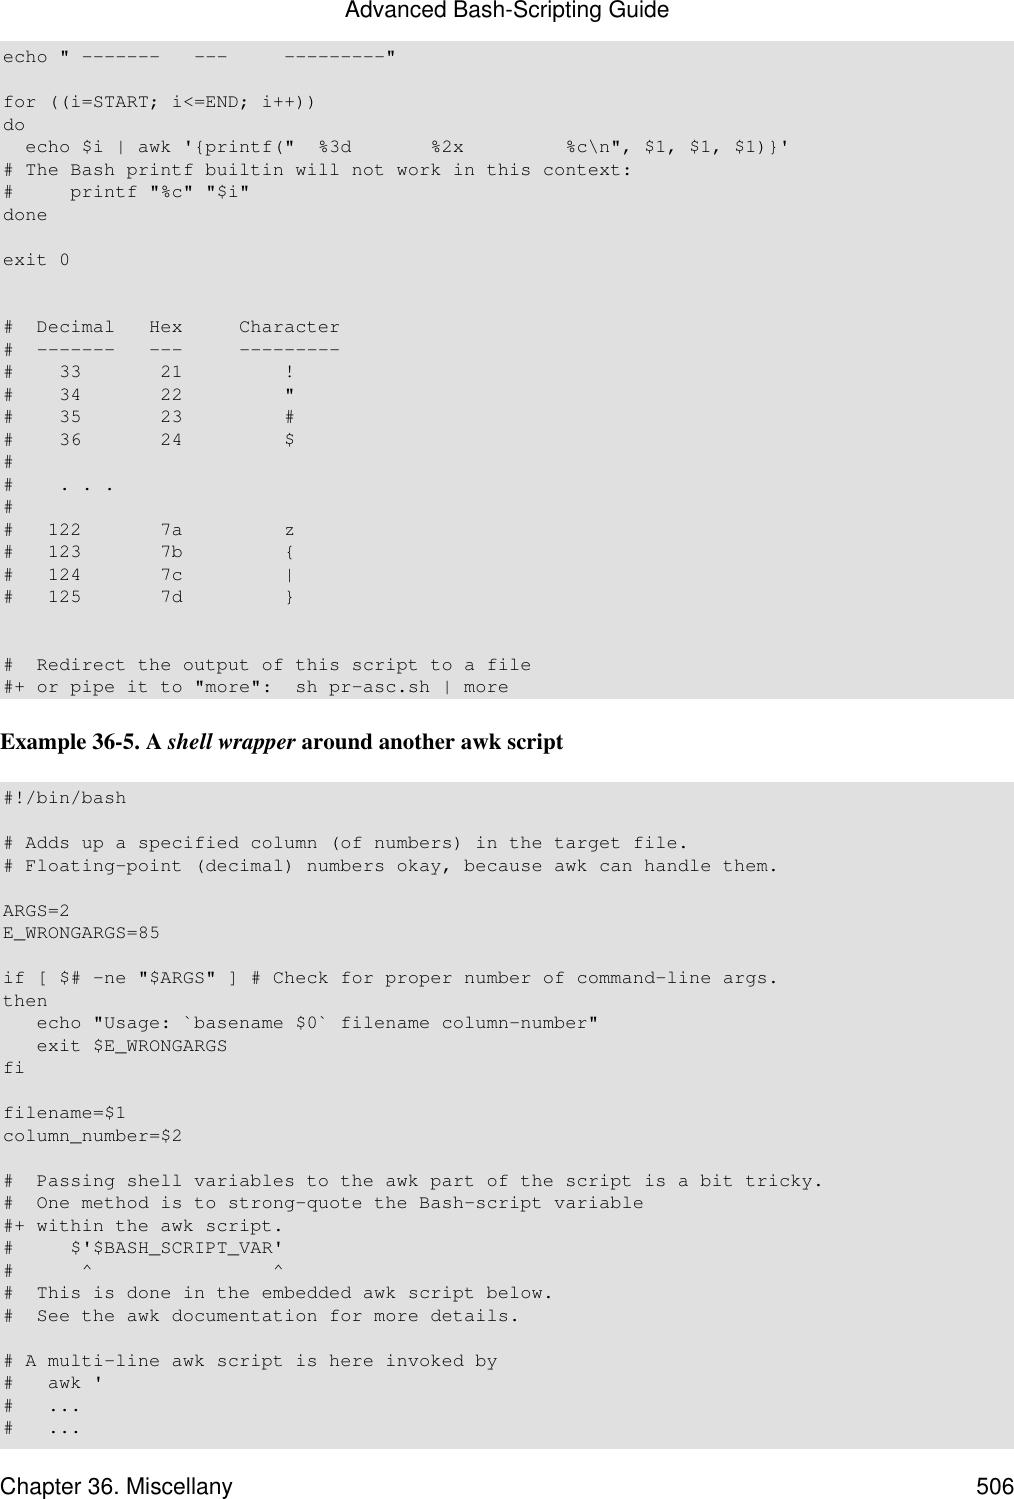 Advanced Bash Scripting Guide